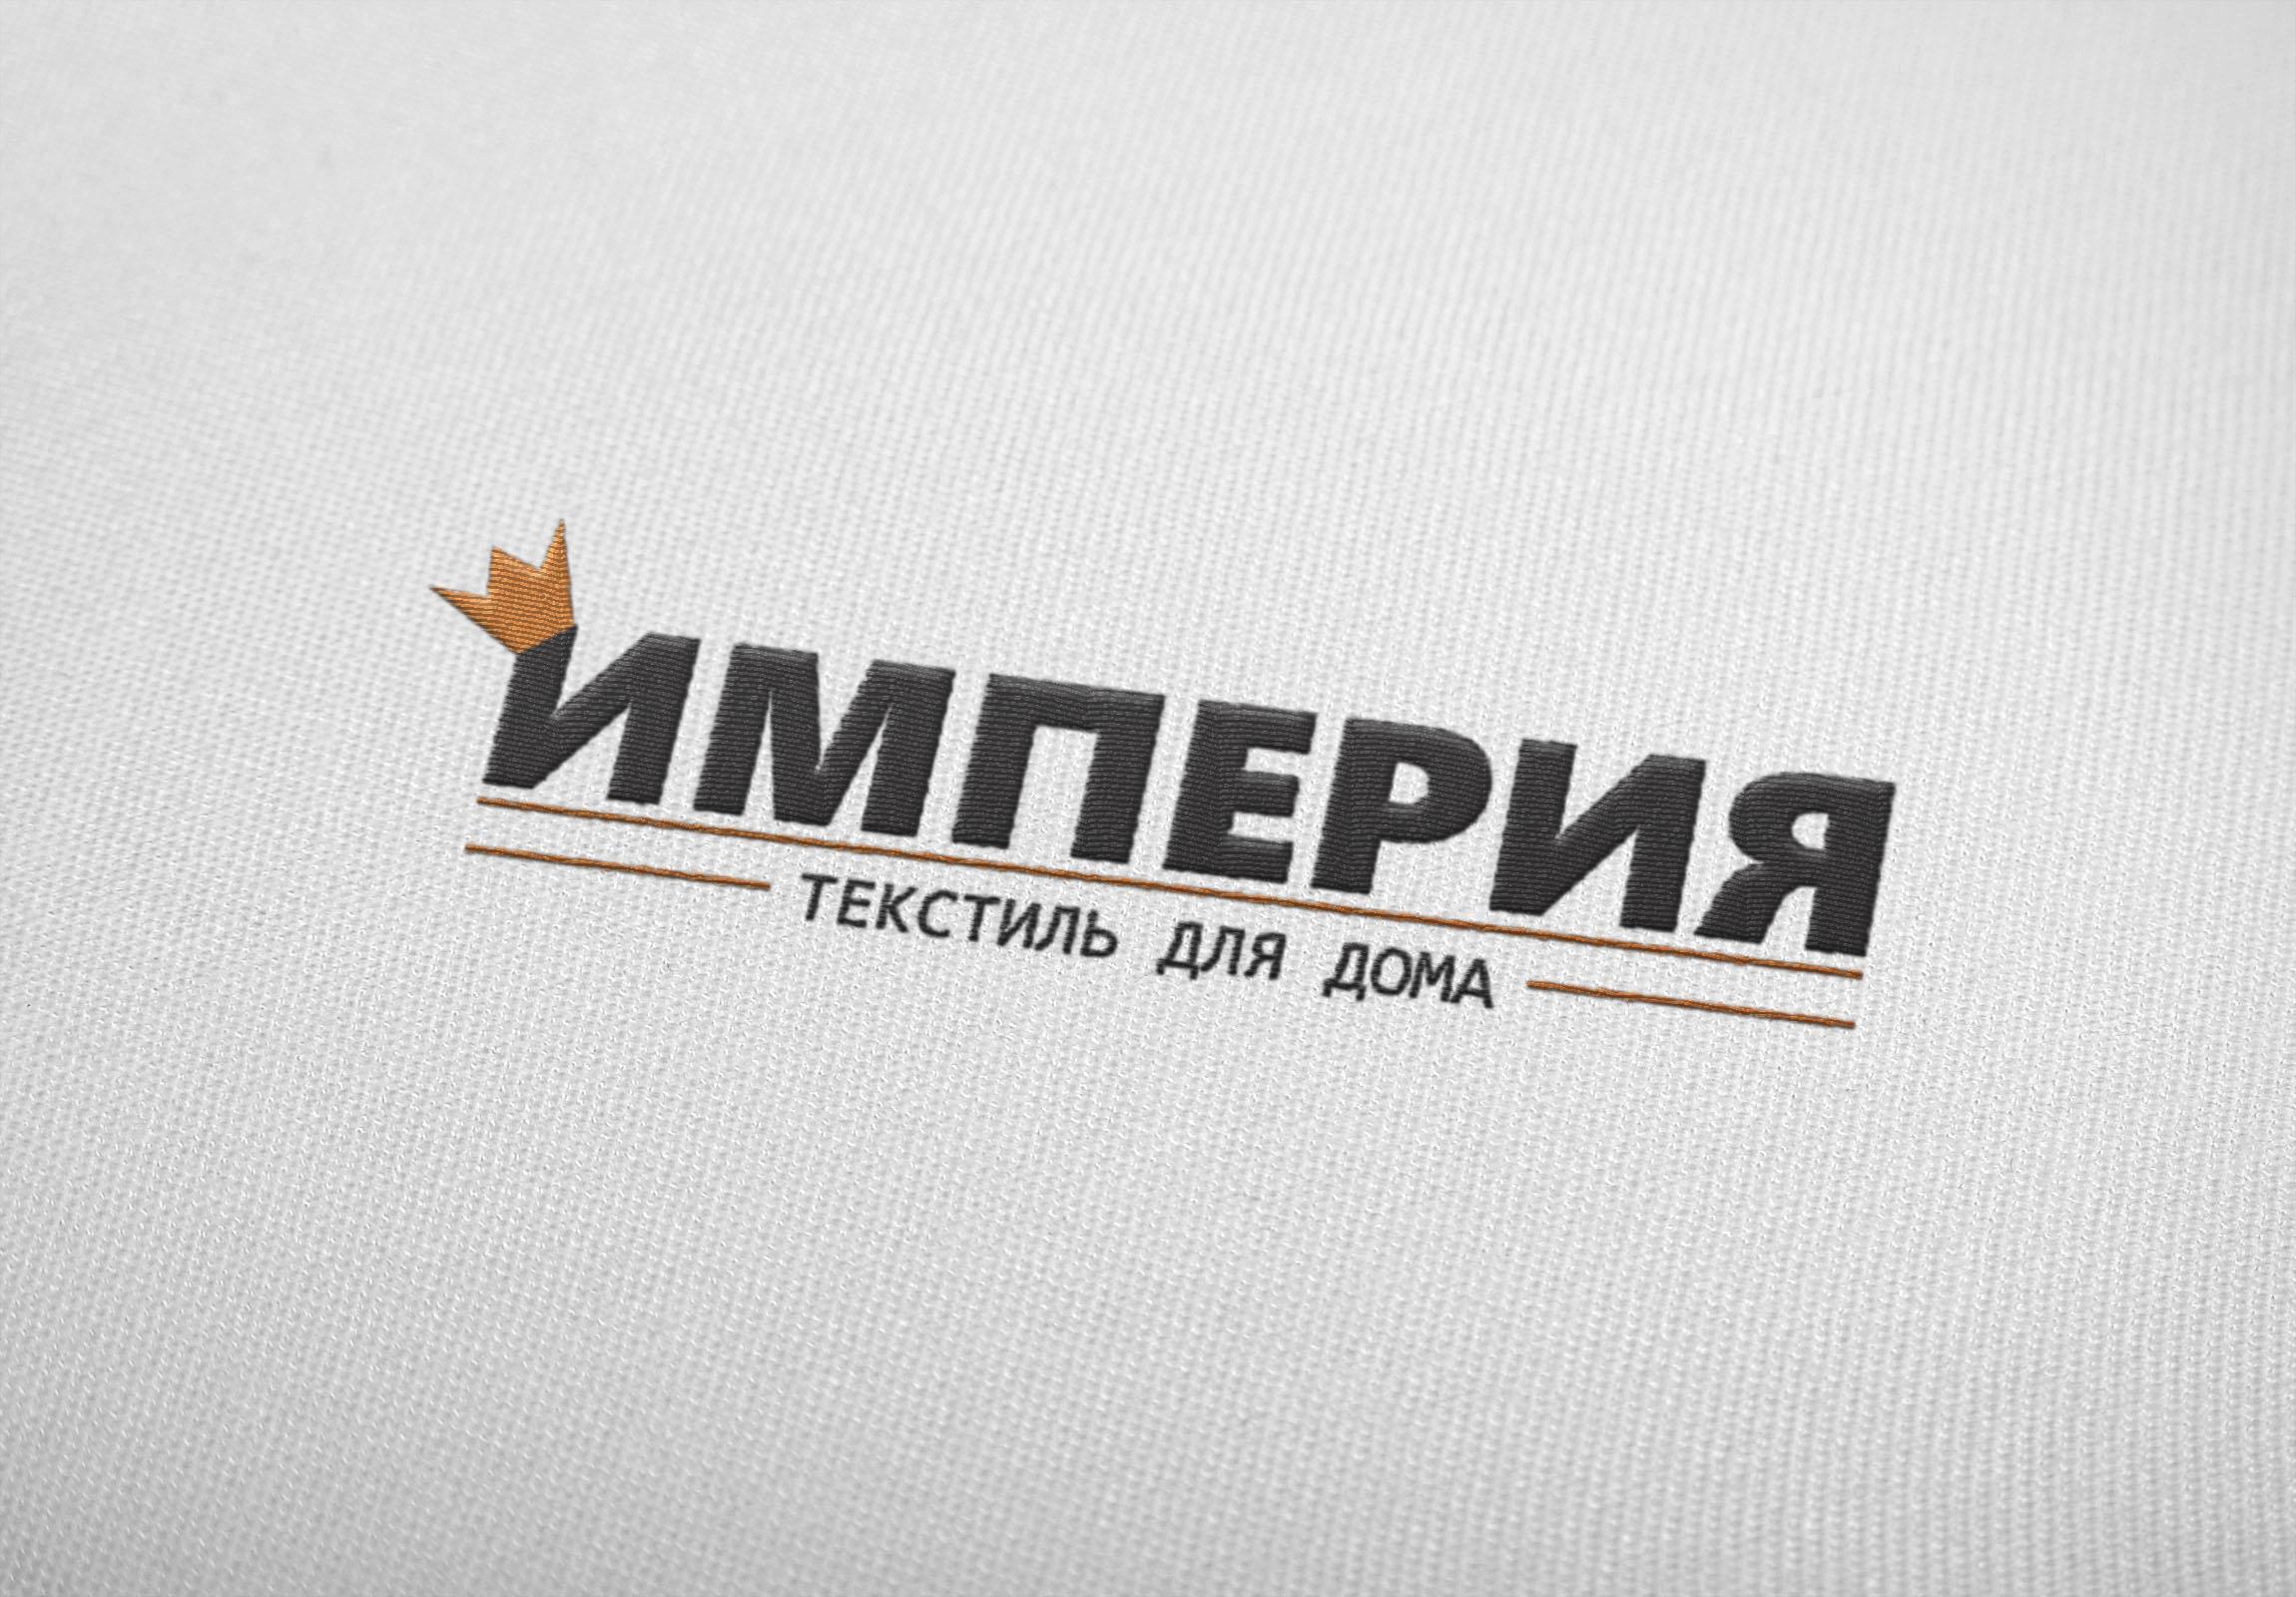 Разработать логотип для нового бренда фото f_76059ea543120eb9.jpg